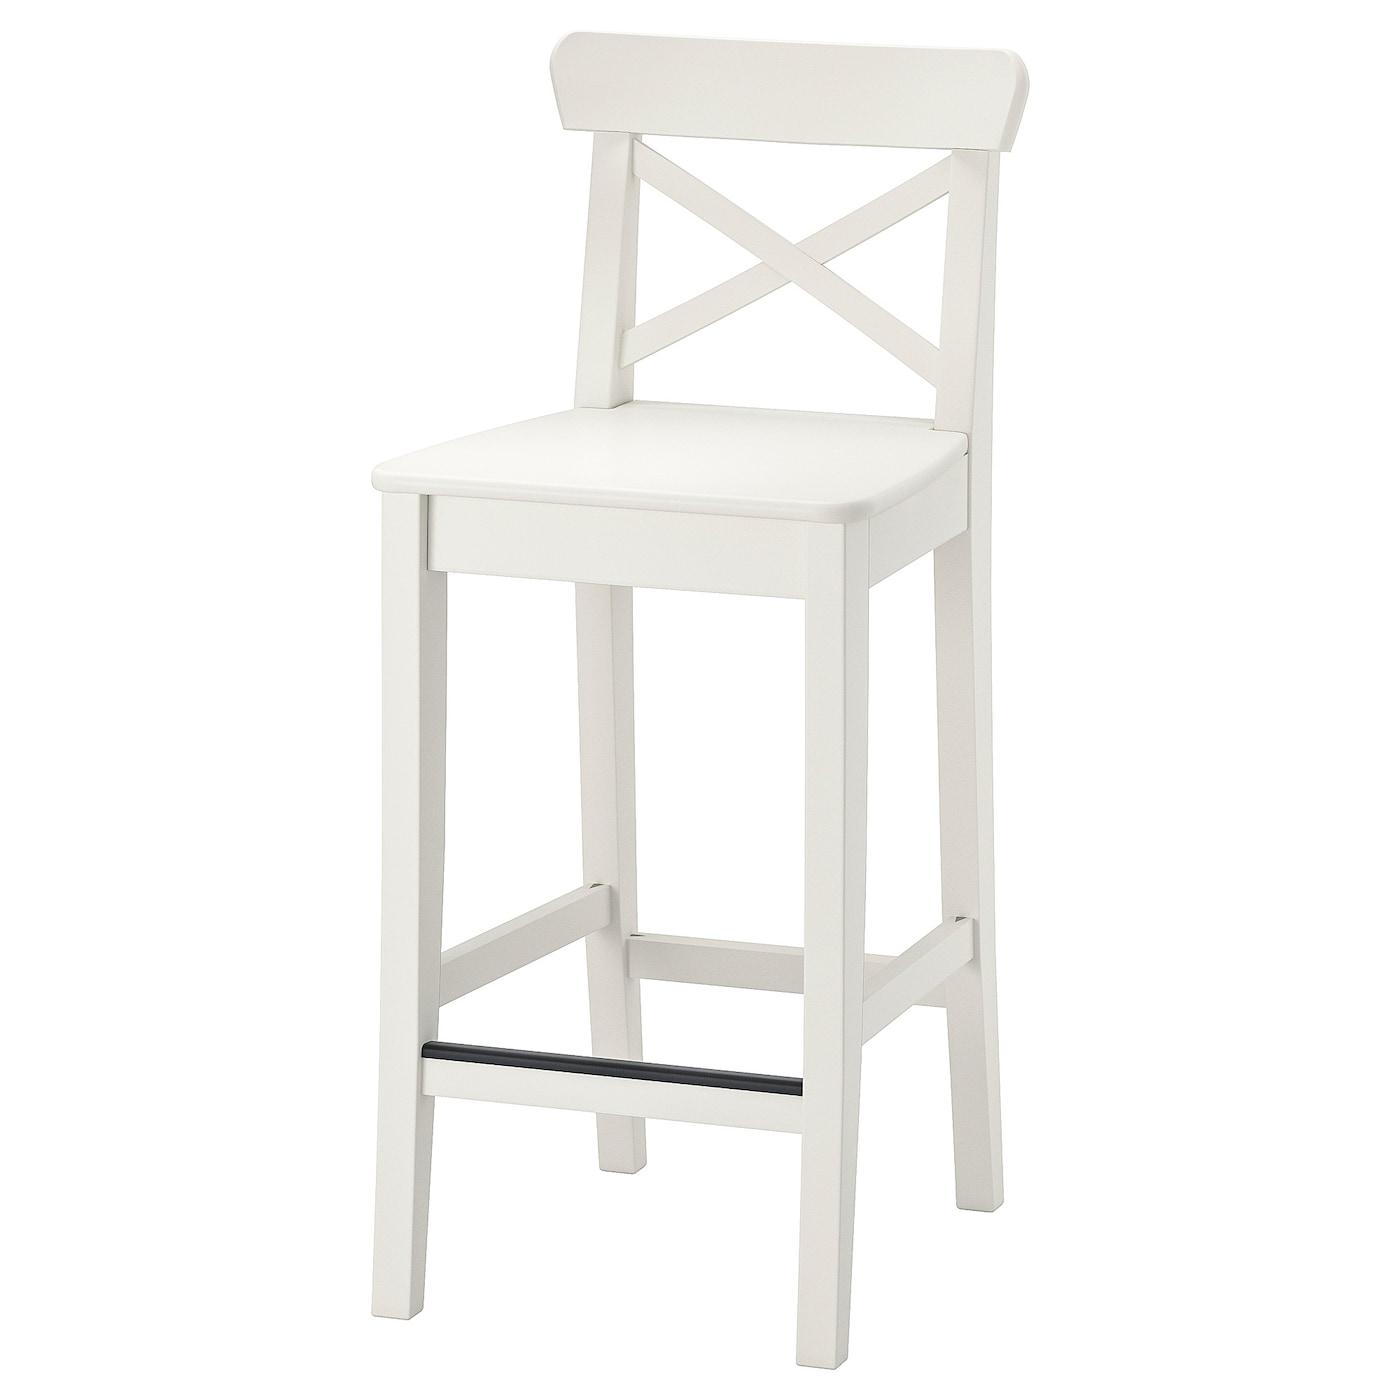 Ingolf Bar Stool With Backrest White